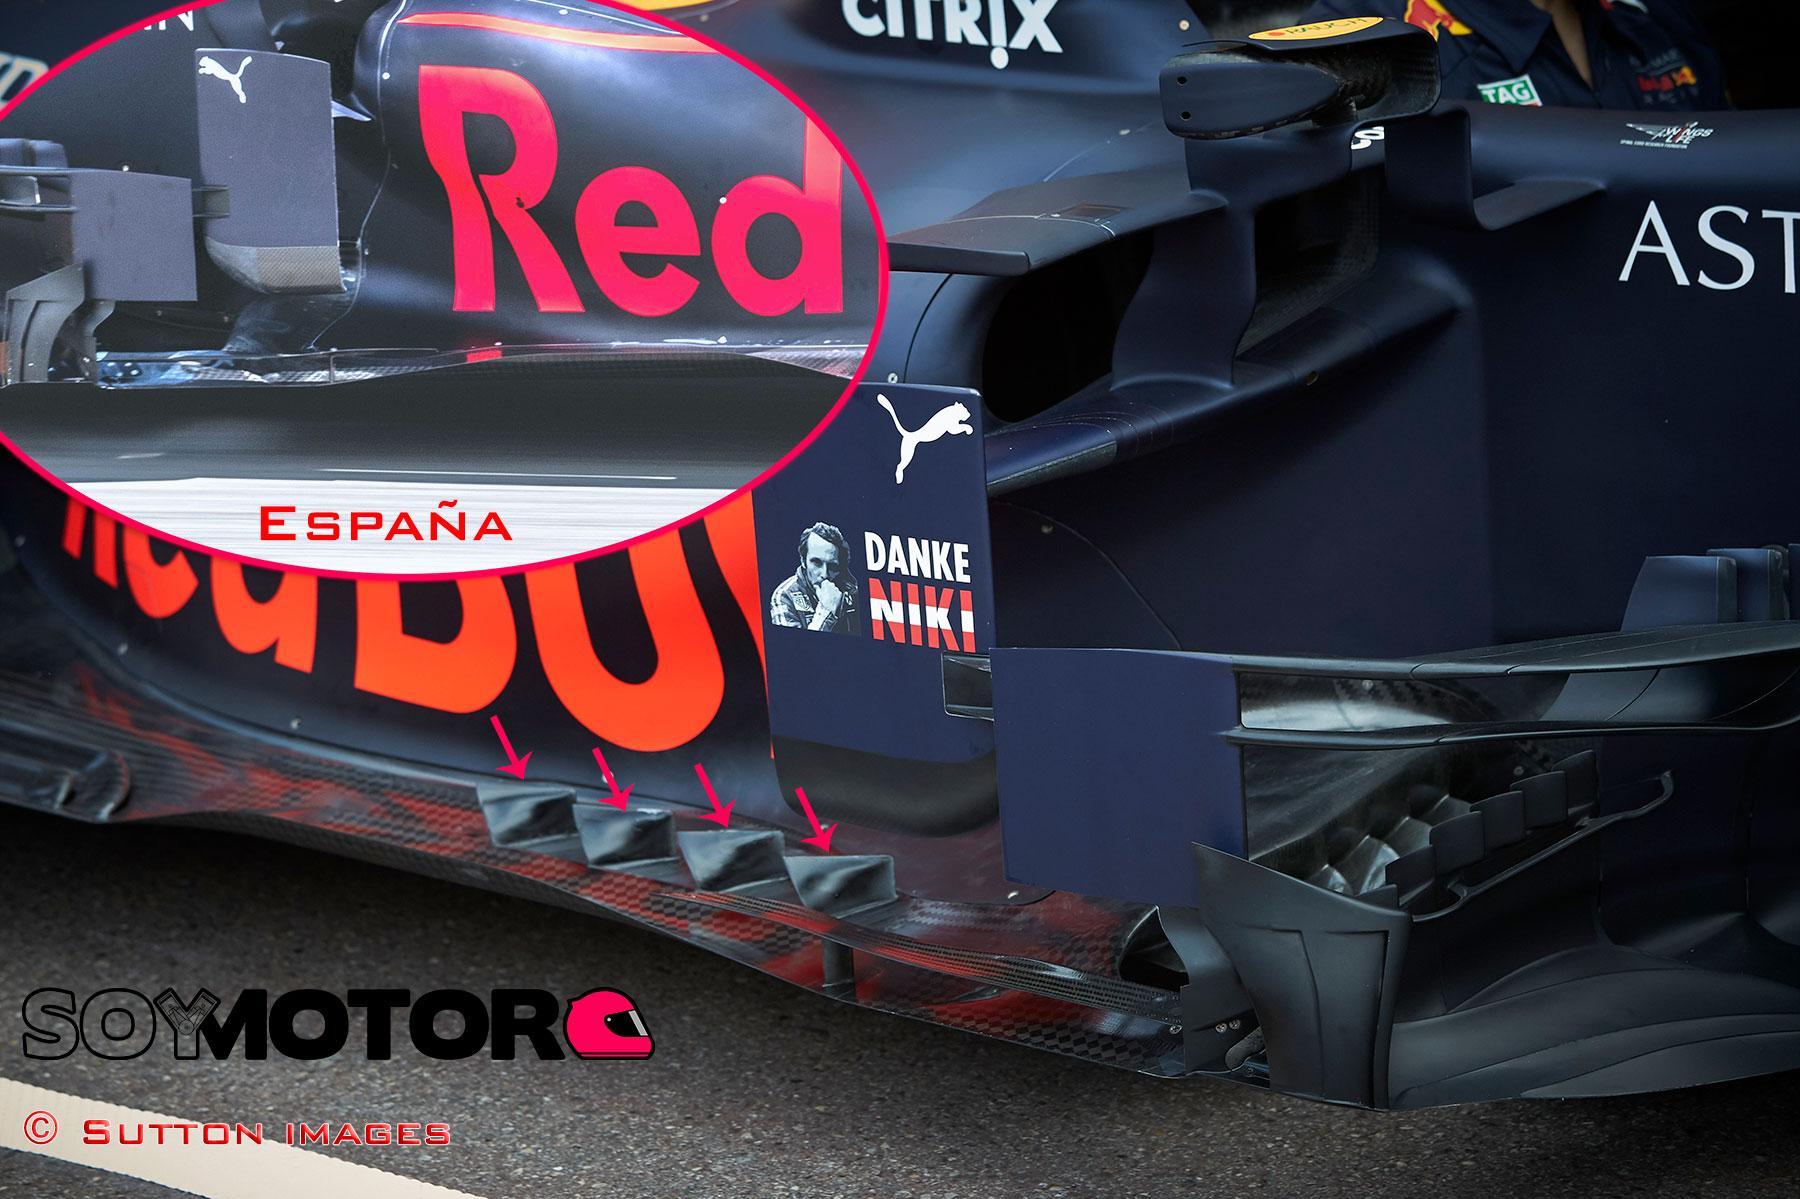 red-bull-deflectortes-suelo-2-soymotor.jpg